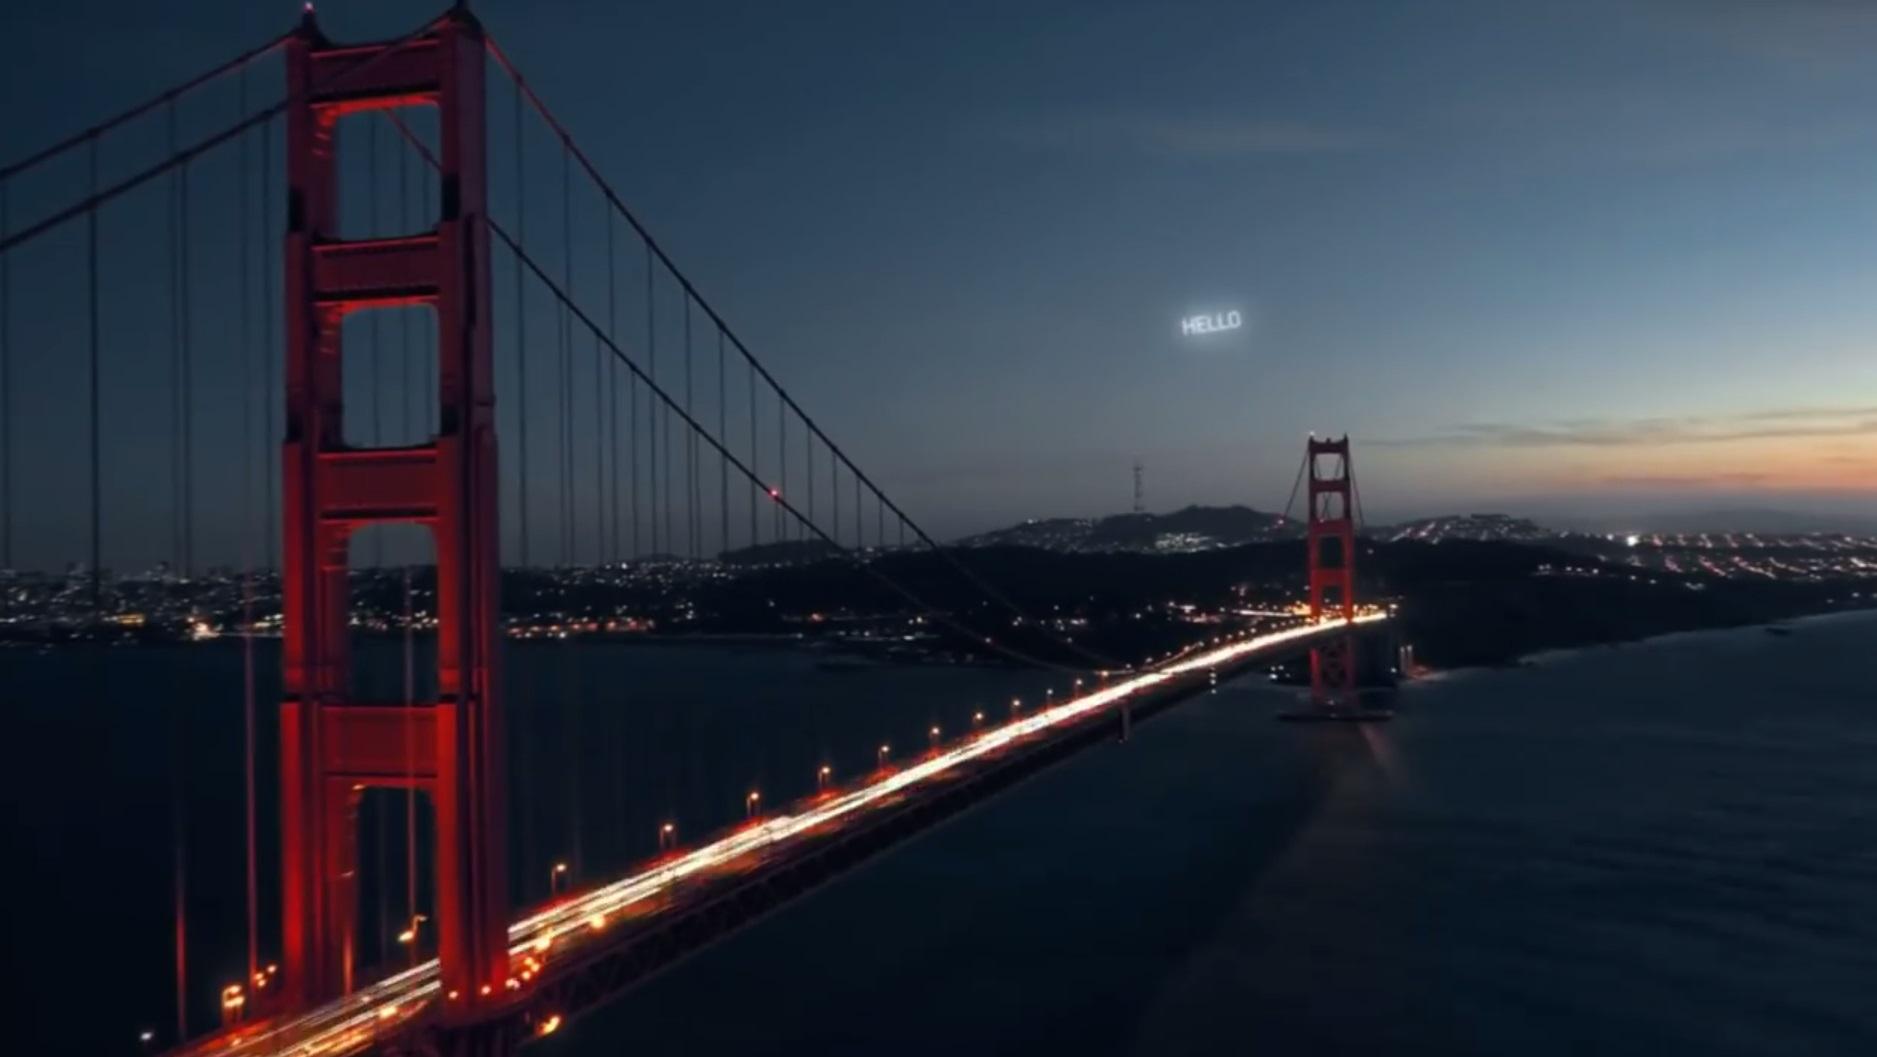 Облачно, вероятна неотключаемая реклама на звездном небе - 16